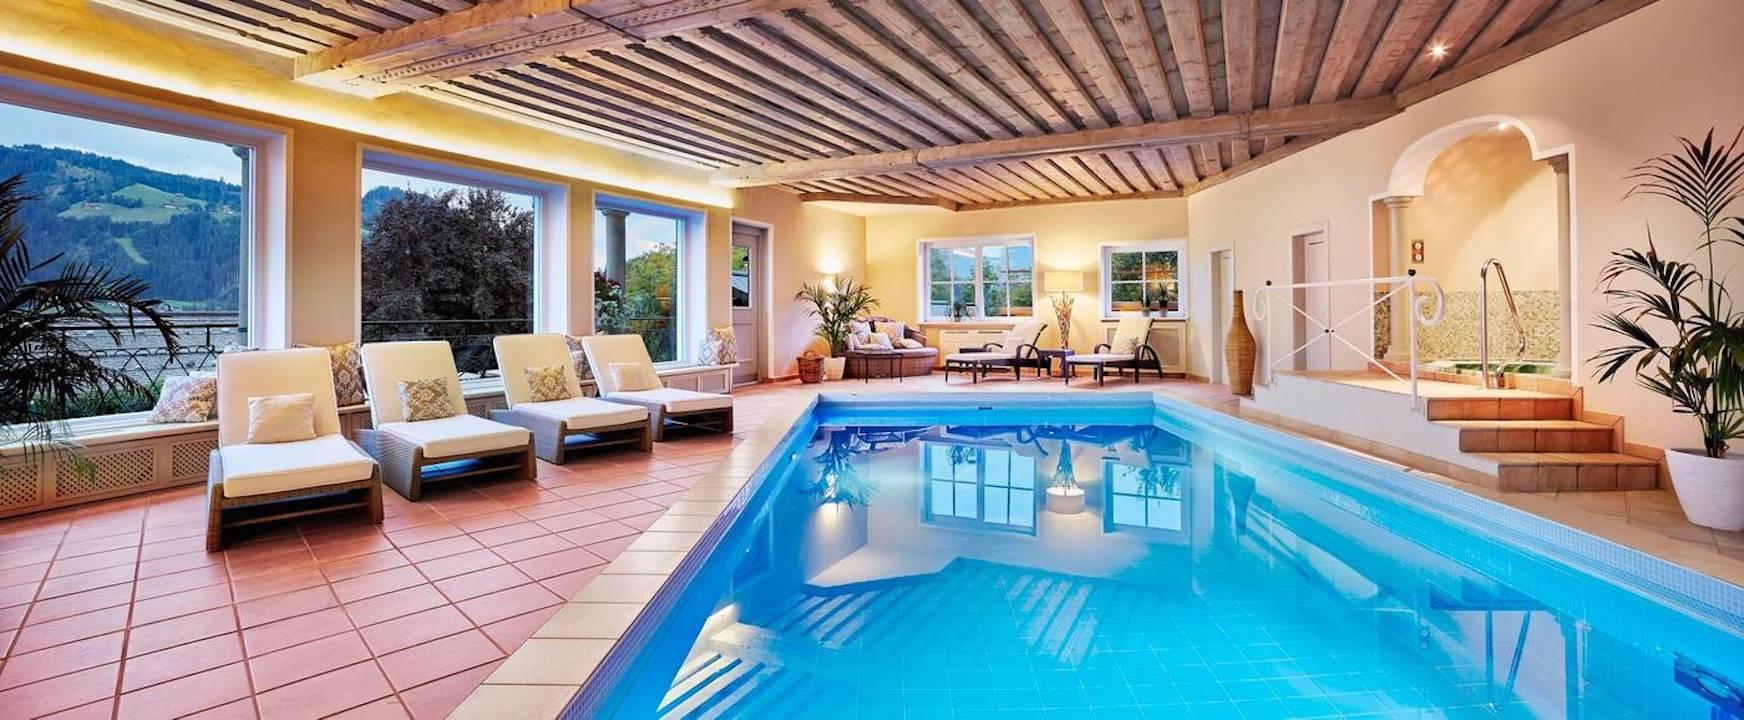 Tennerhof , Gourmet & Spa de Charme Hotel , Kitzbuhel / Austria